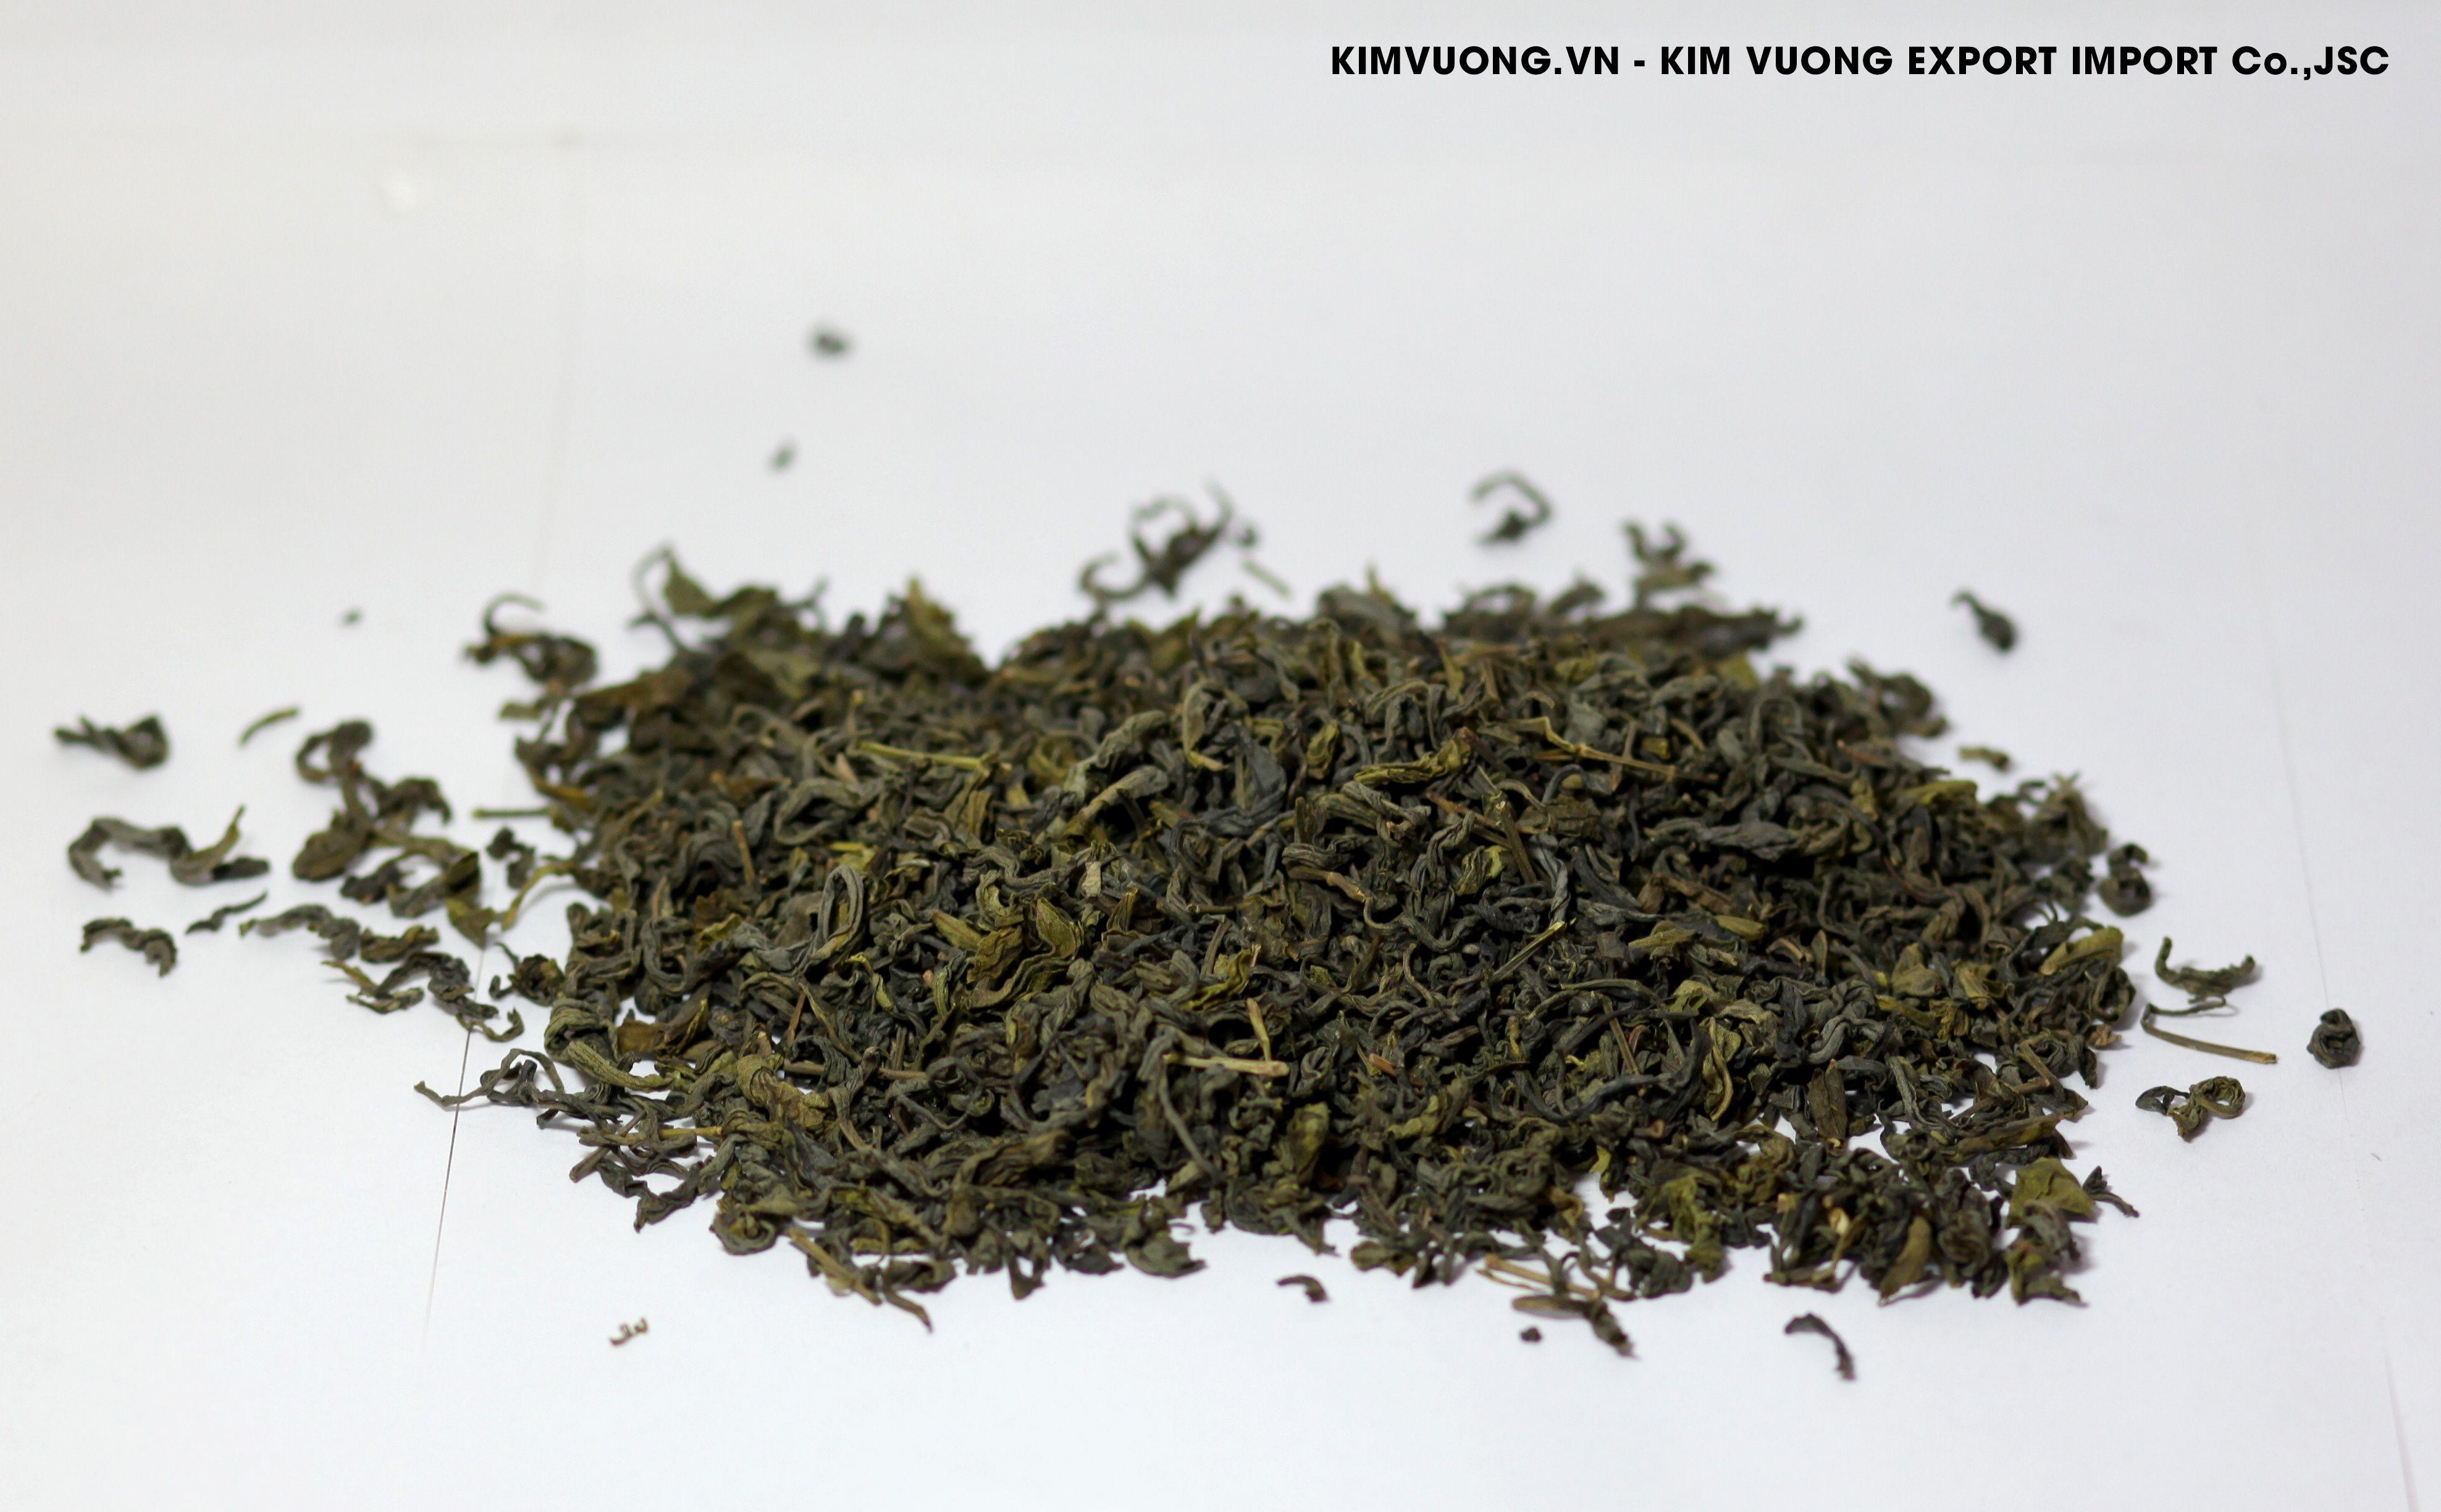 Green tea OP 592 tea - KIM VUONG EXPORT IMPORT Co.,JSC